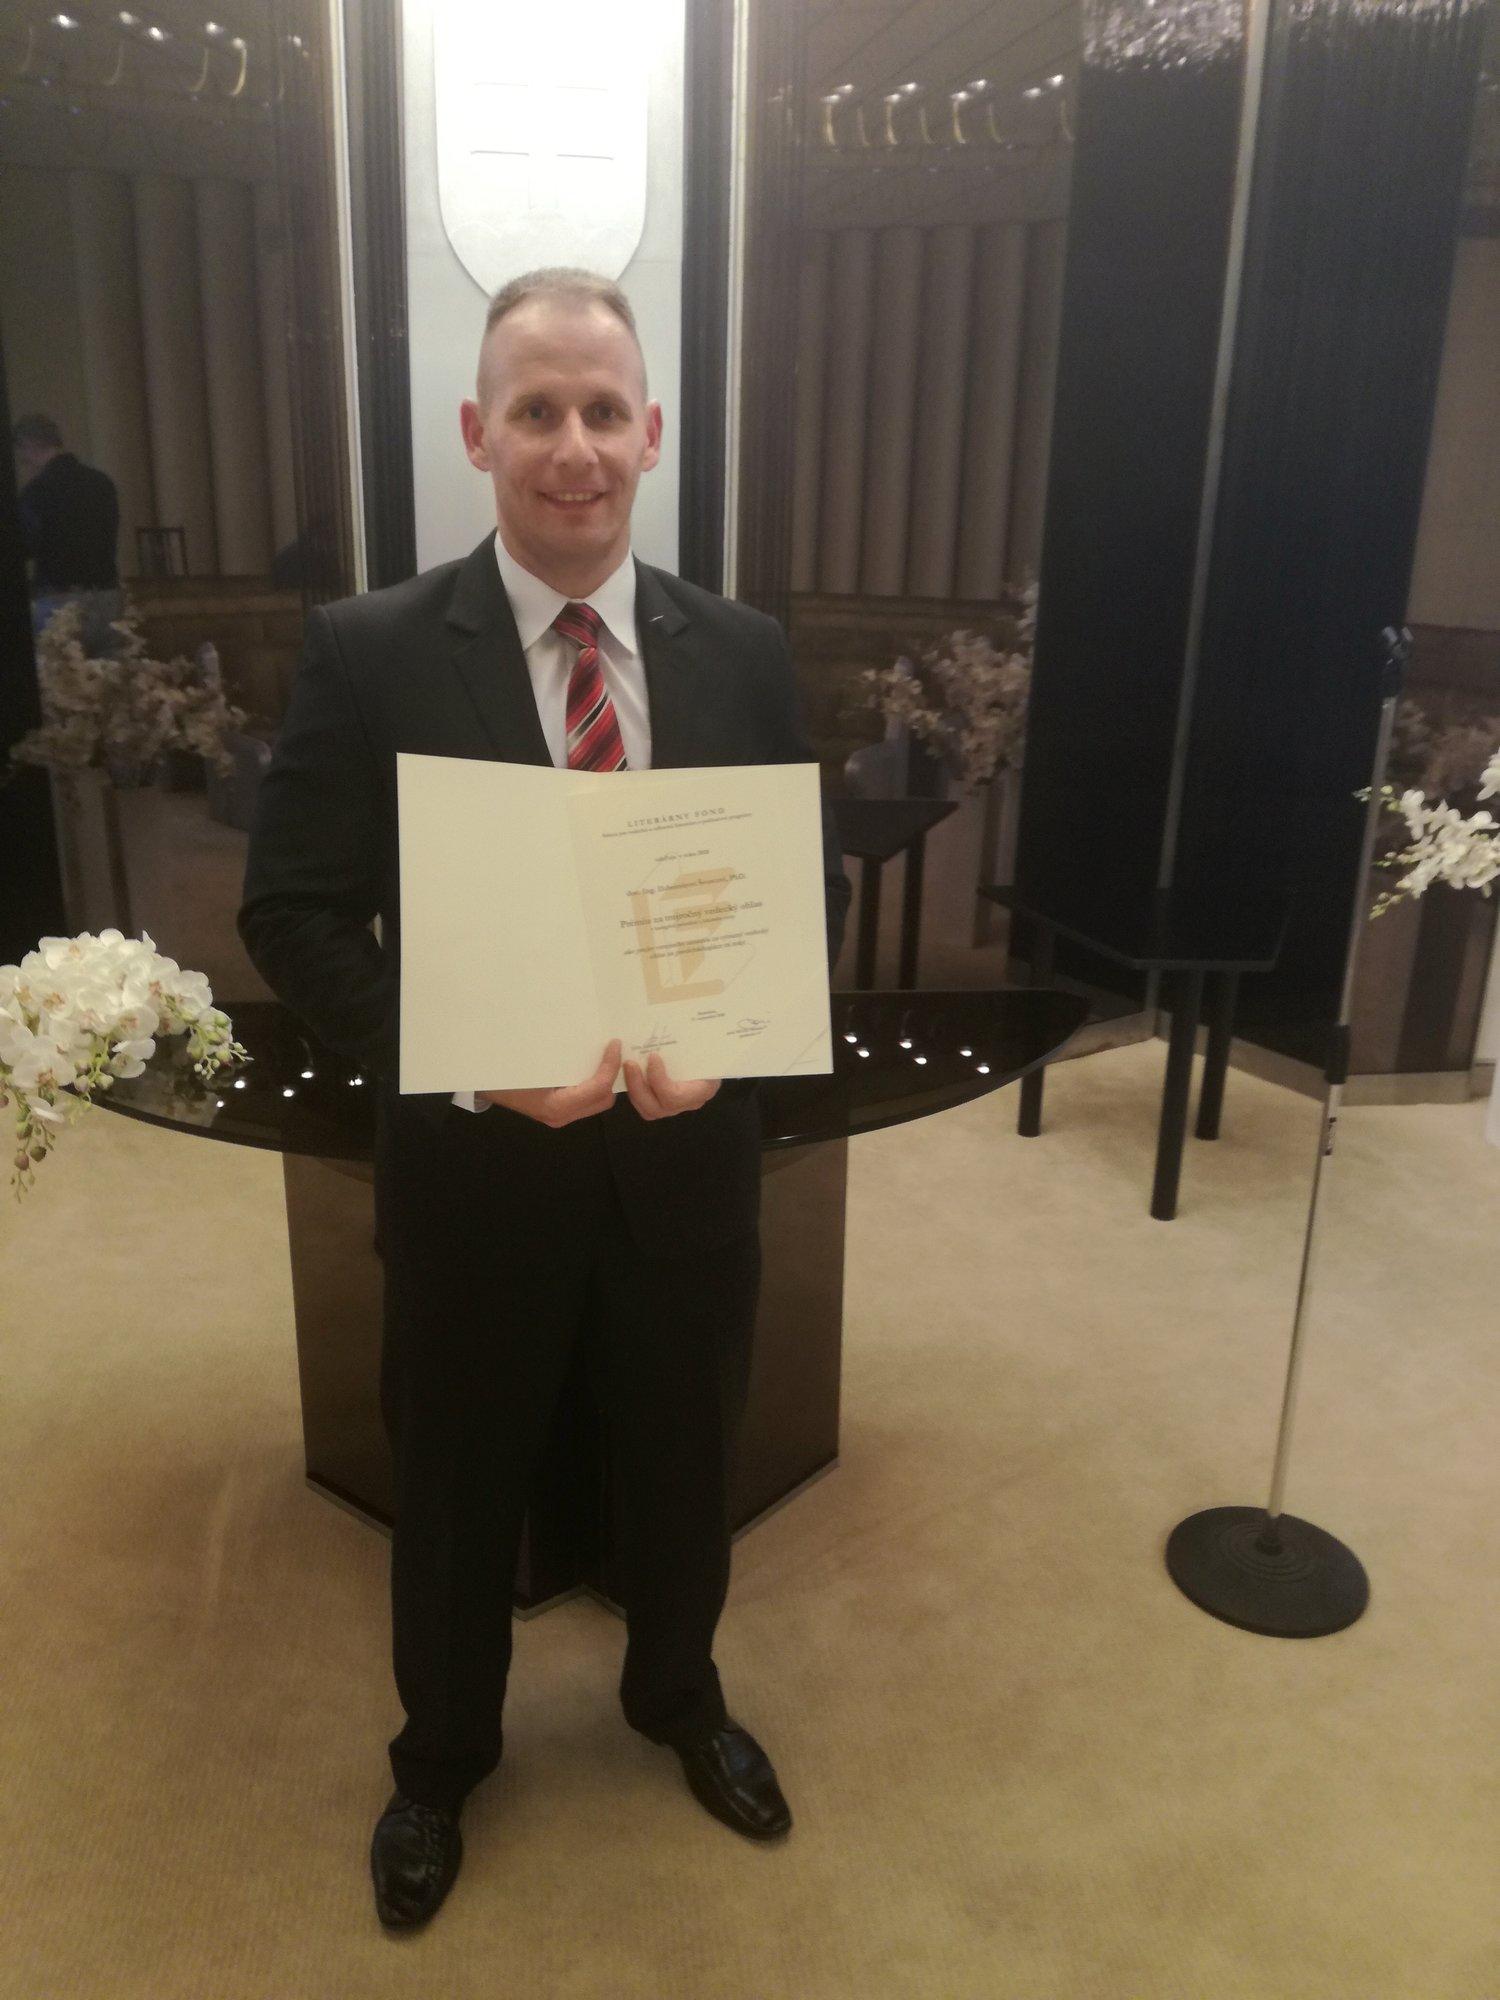 Ocenenie docenta Ľubomíra Švorca a docenta Michala Kvasnicu